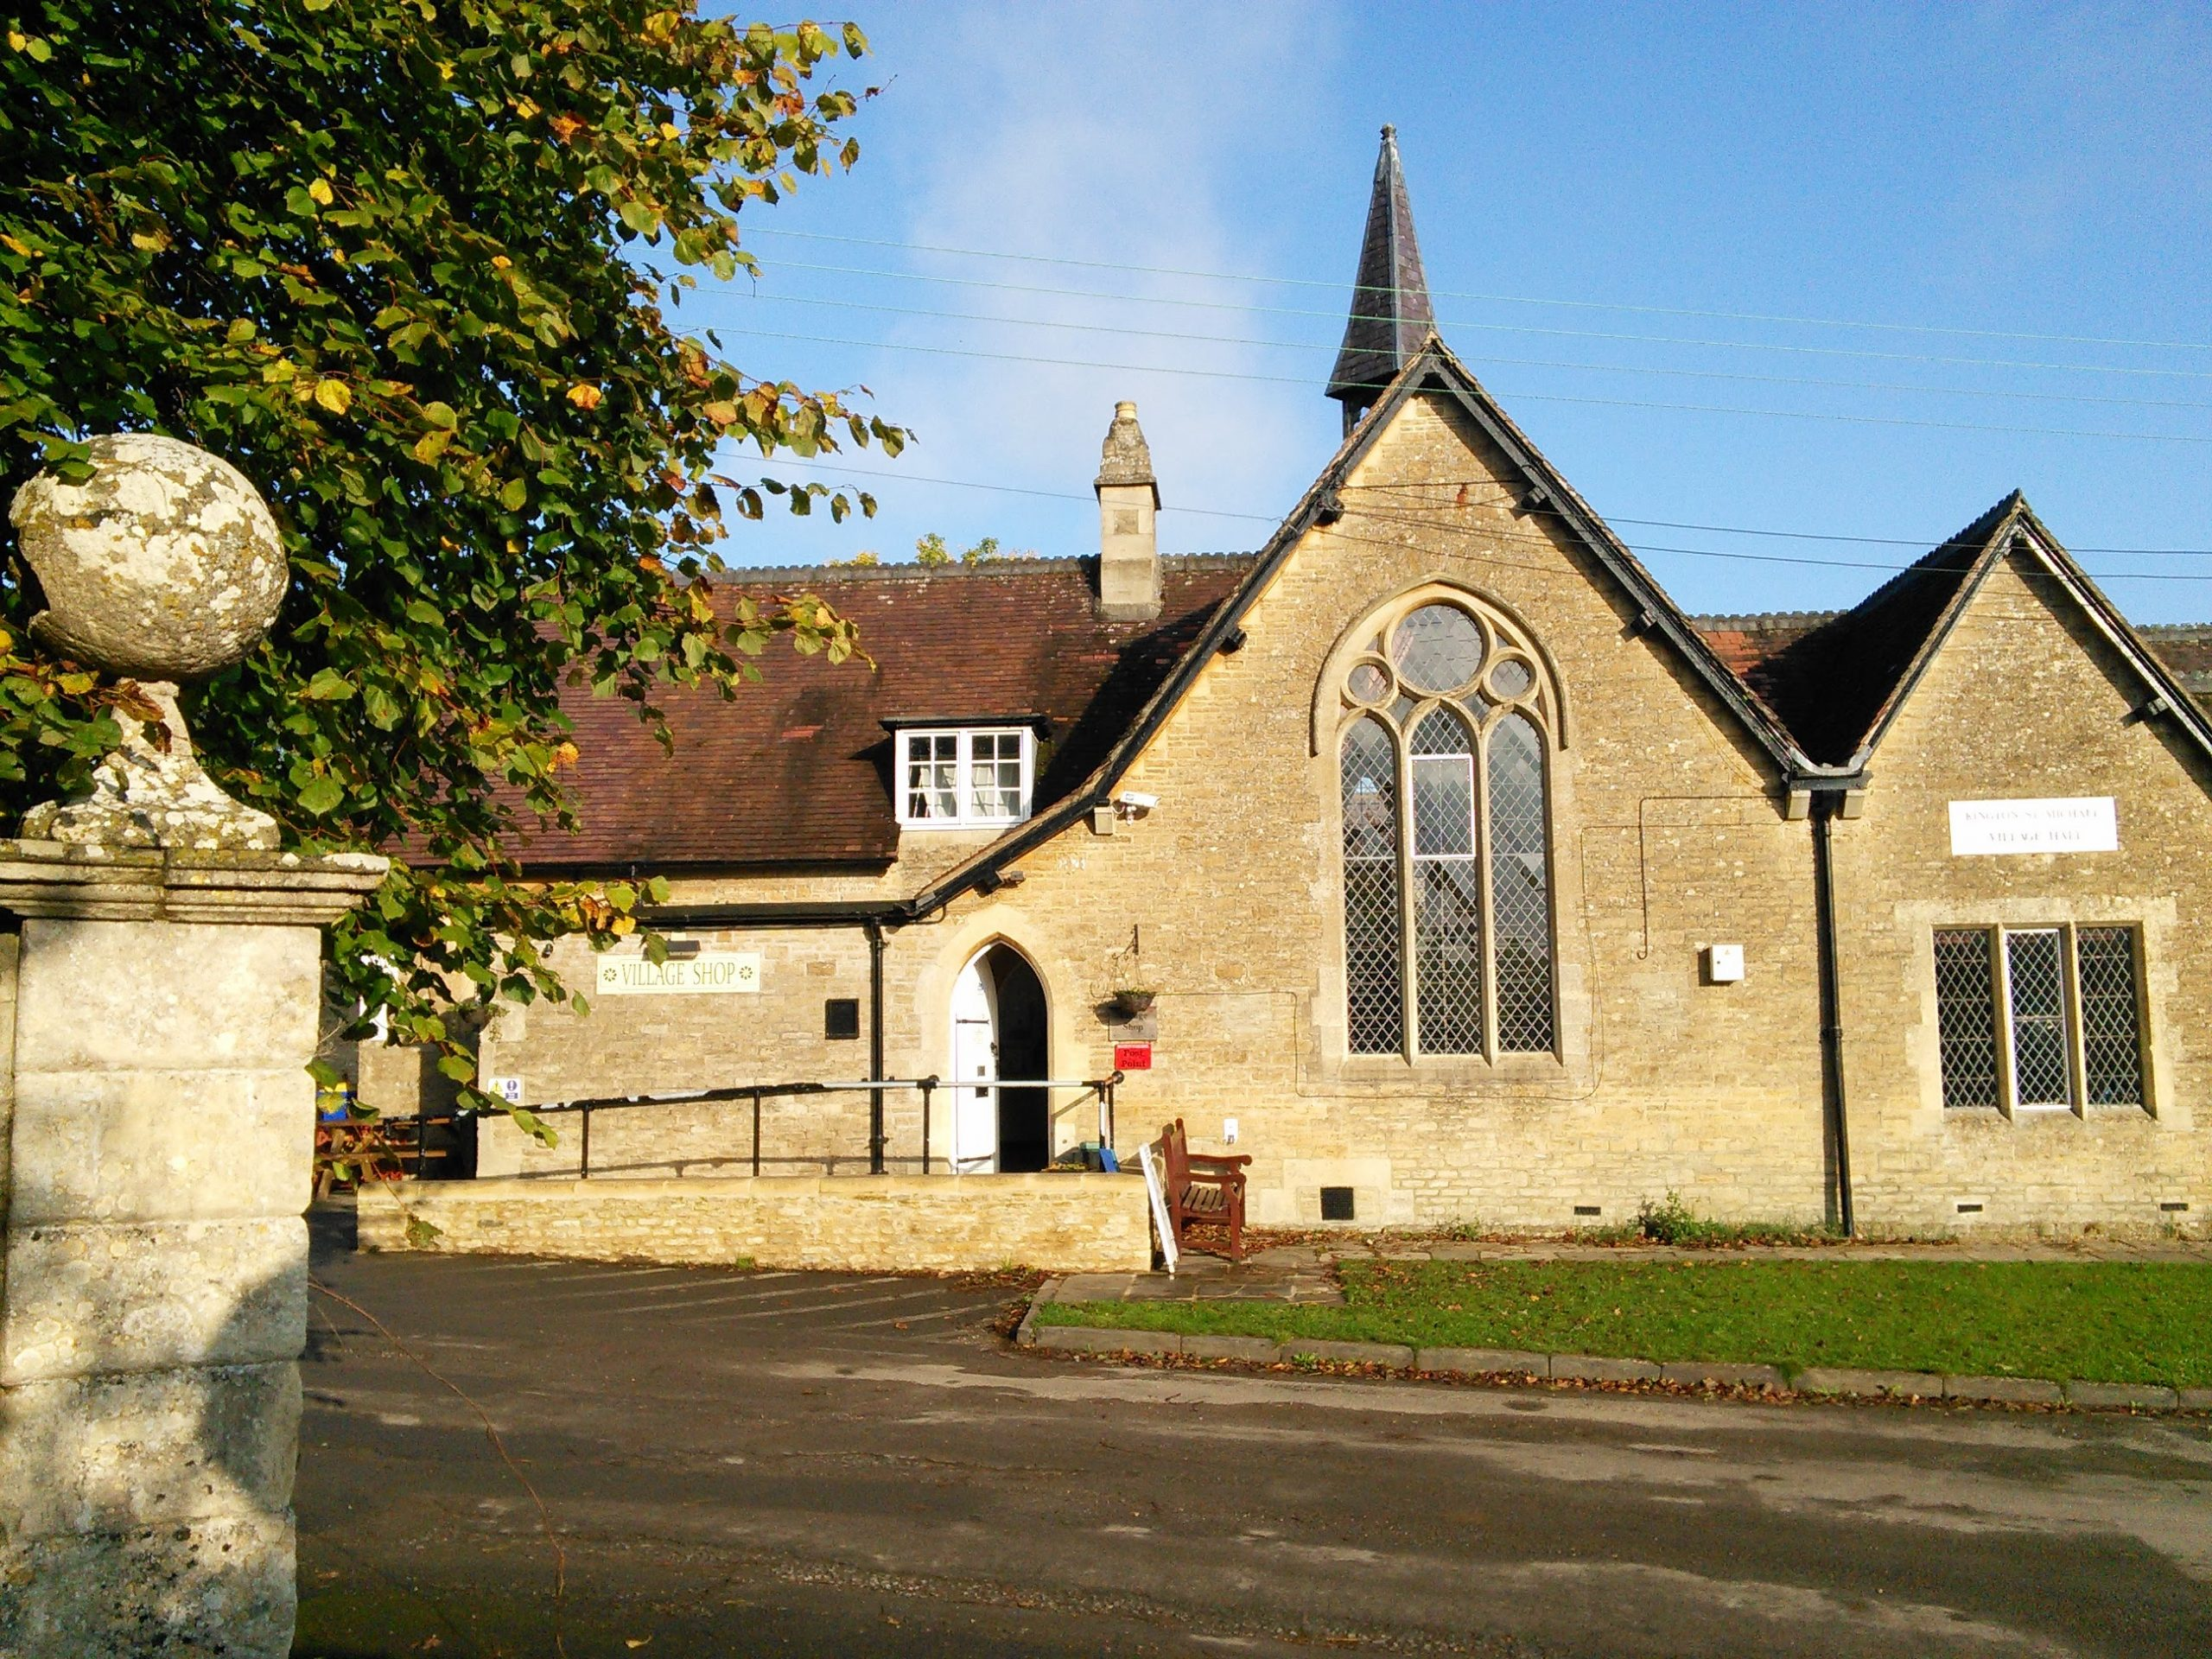 Kington St Michael Village Hall